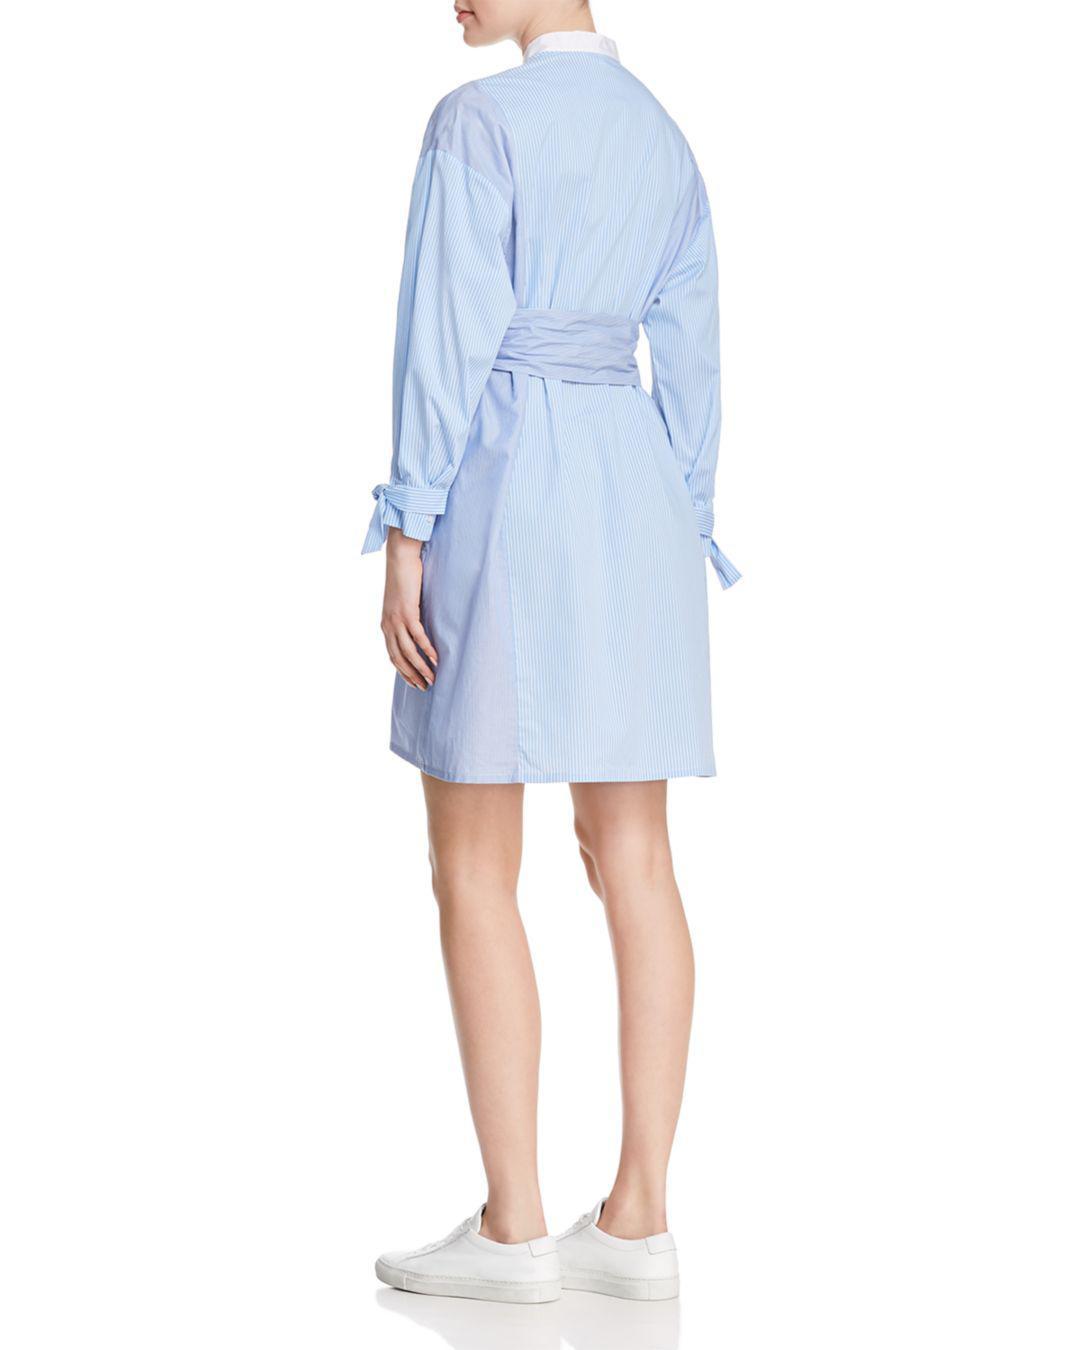 71042e67d9f Lyst - Maje Carty Striped Shirt Dress in Blue